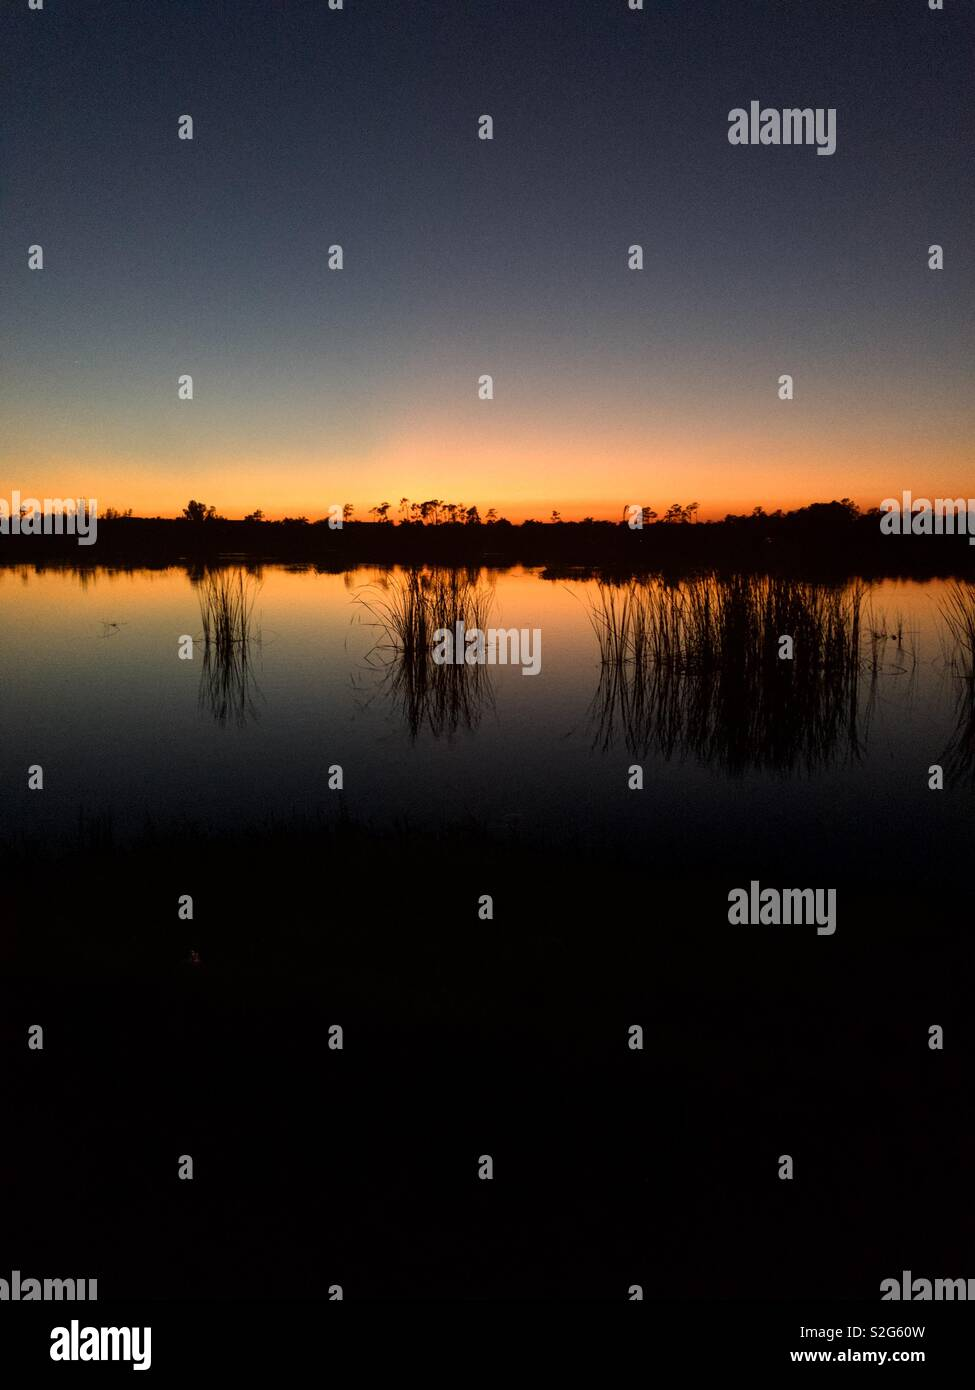 Florida sunset - Stock Image